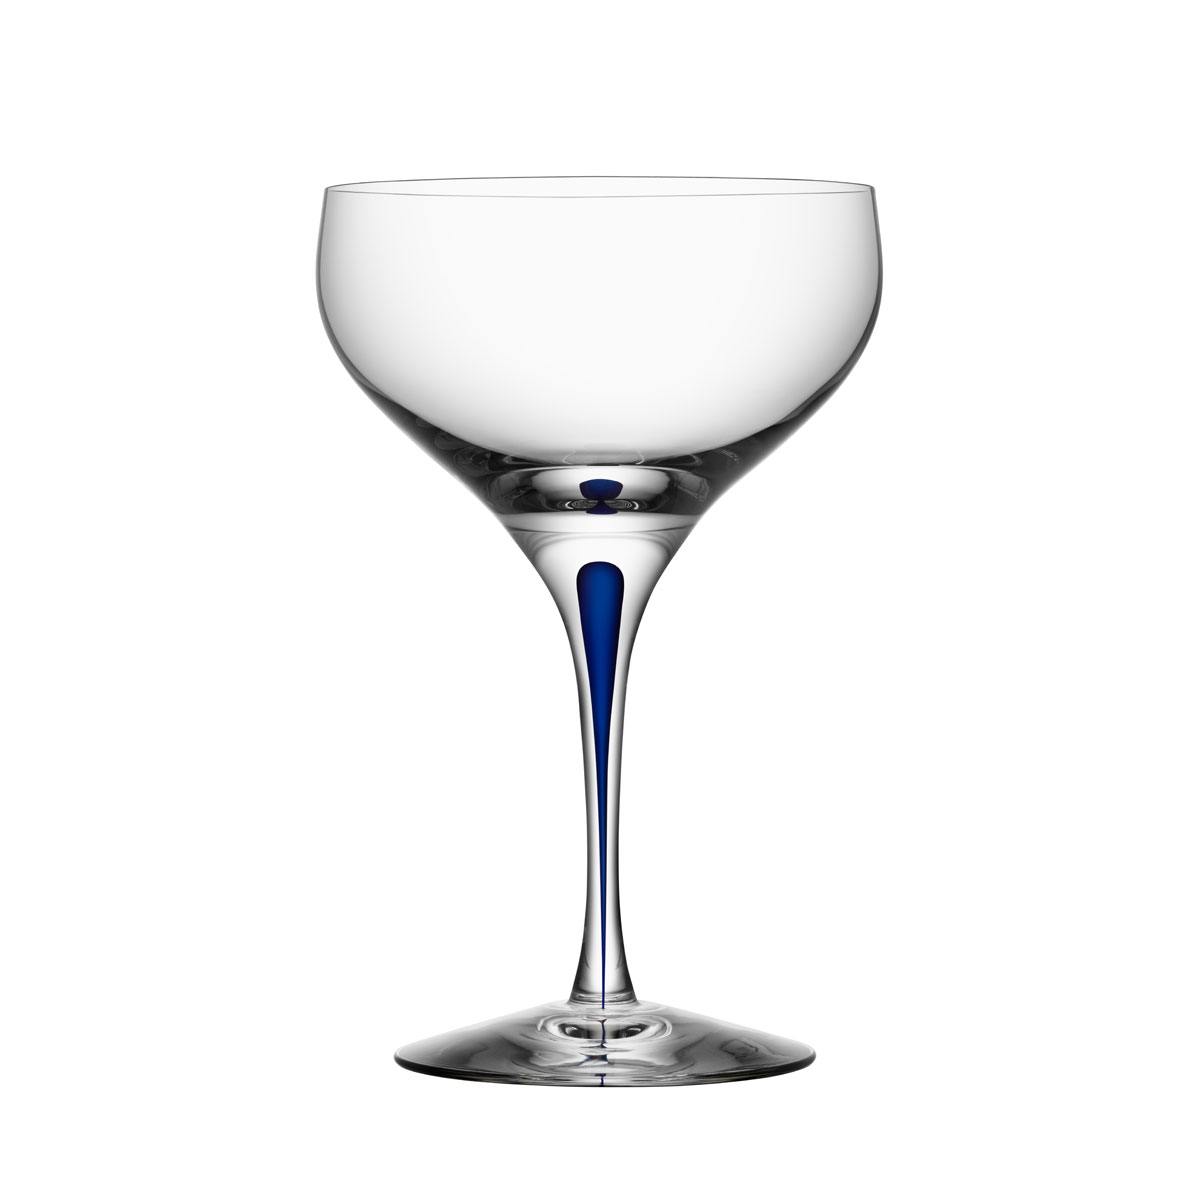 Orrefors Intermezzo Blue Coupe Champagne Cocktail Glass, Single